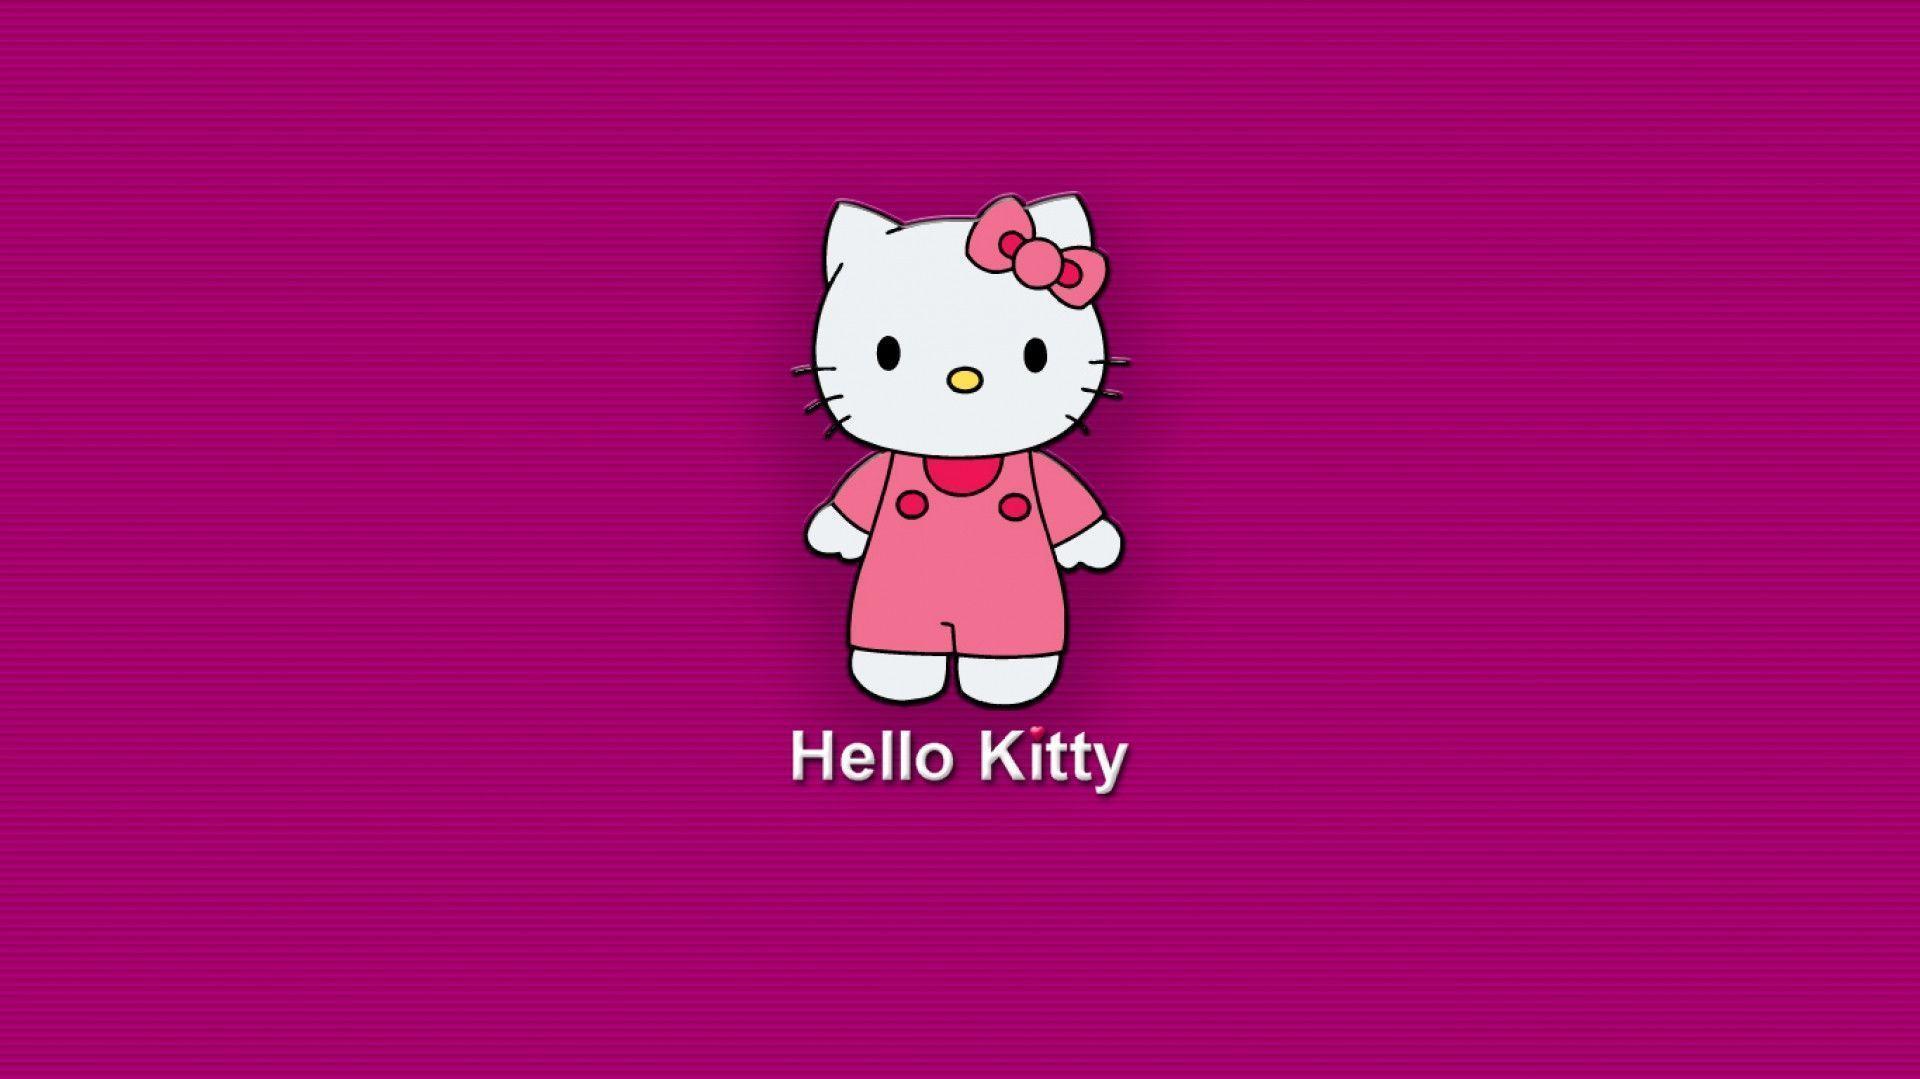 Great Wallpaper Hello Kitty Desktop Background - jLcXaFU  Snapshot_347652.jpg